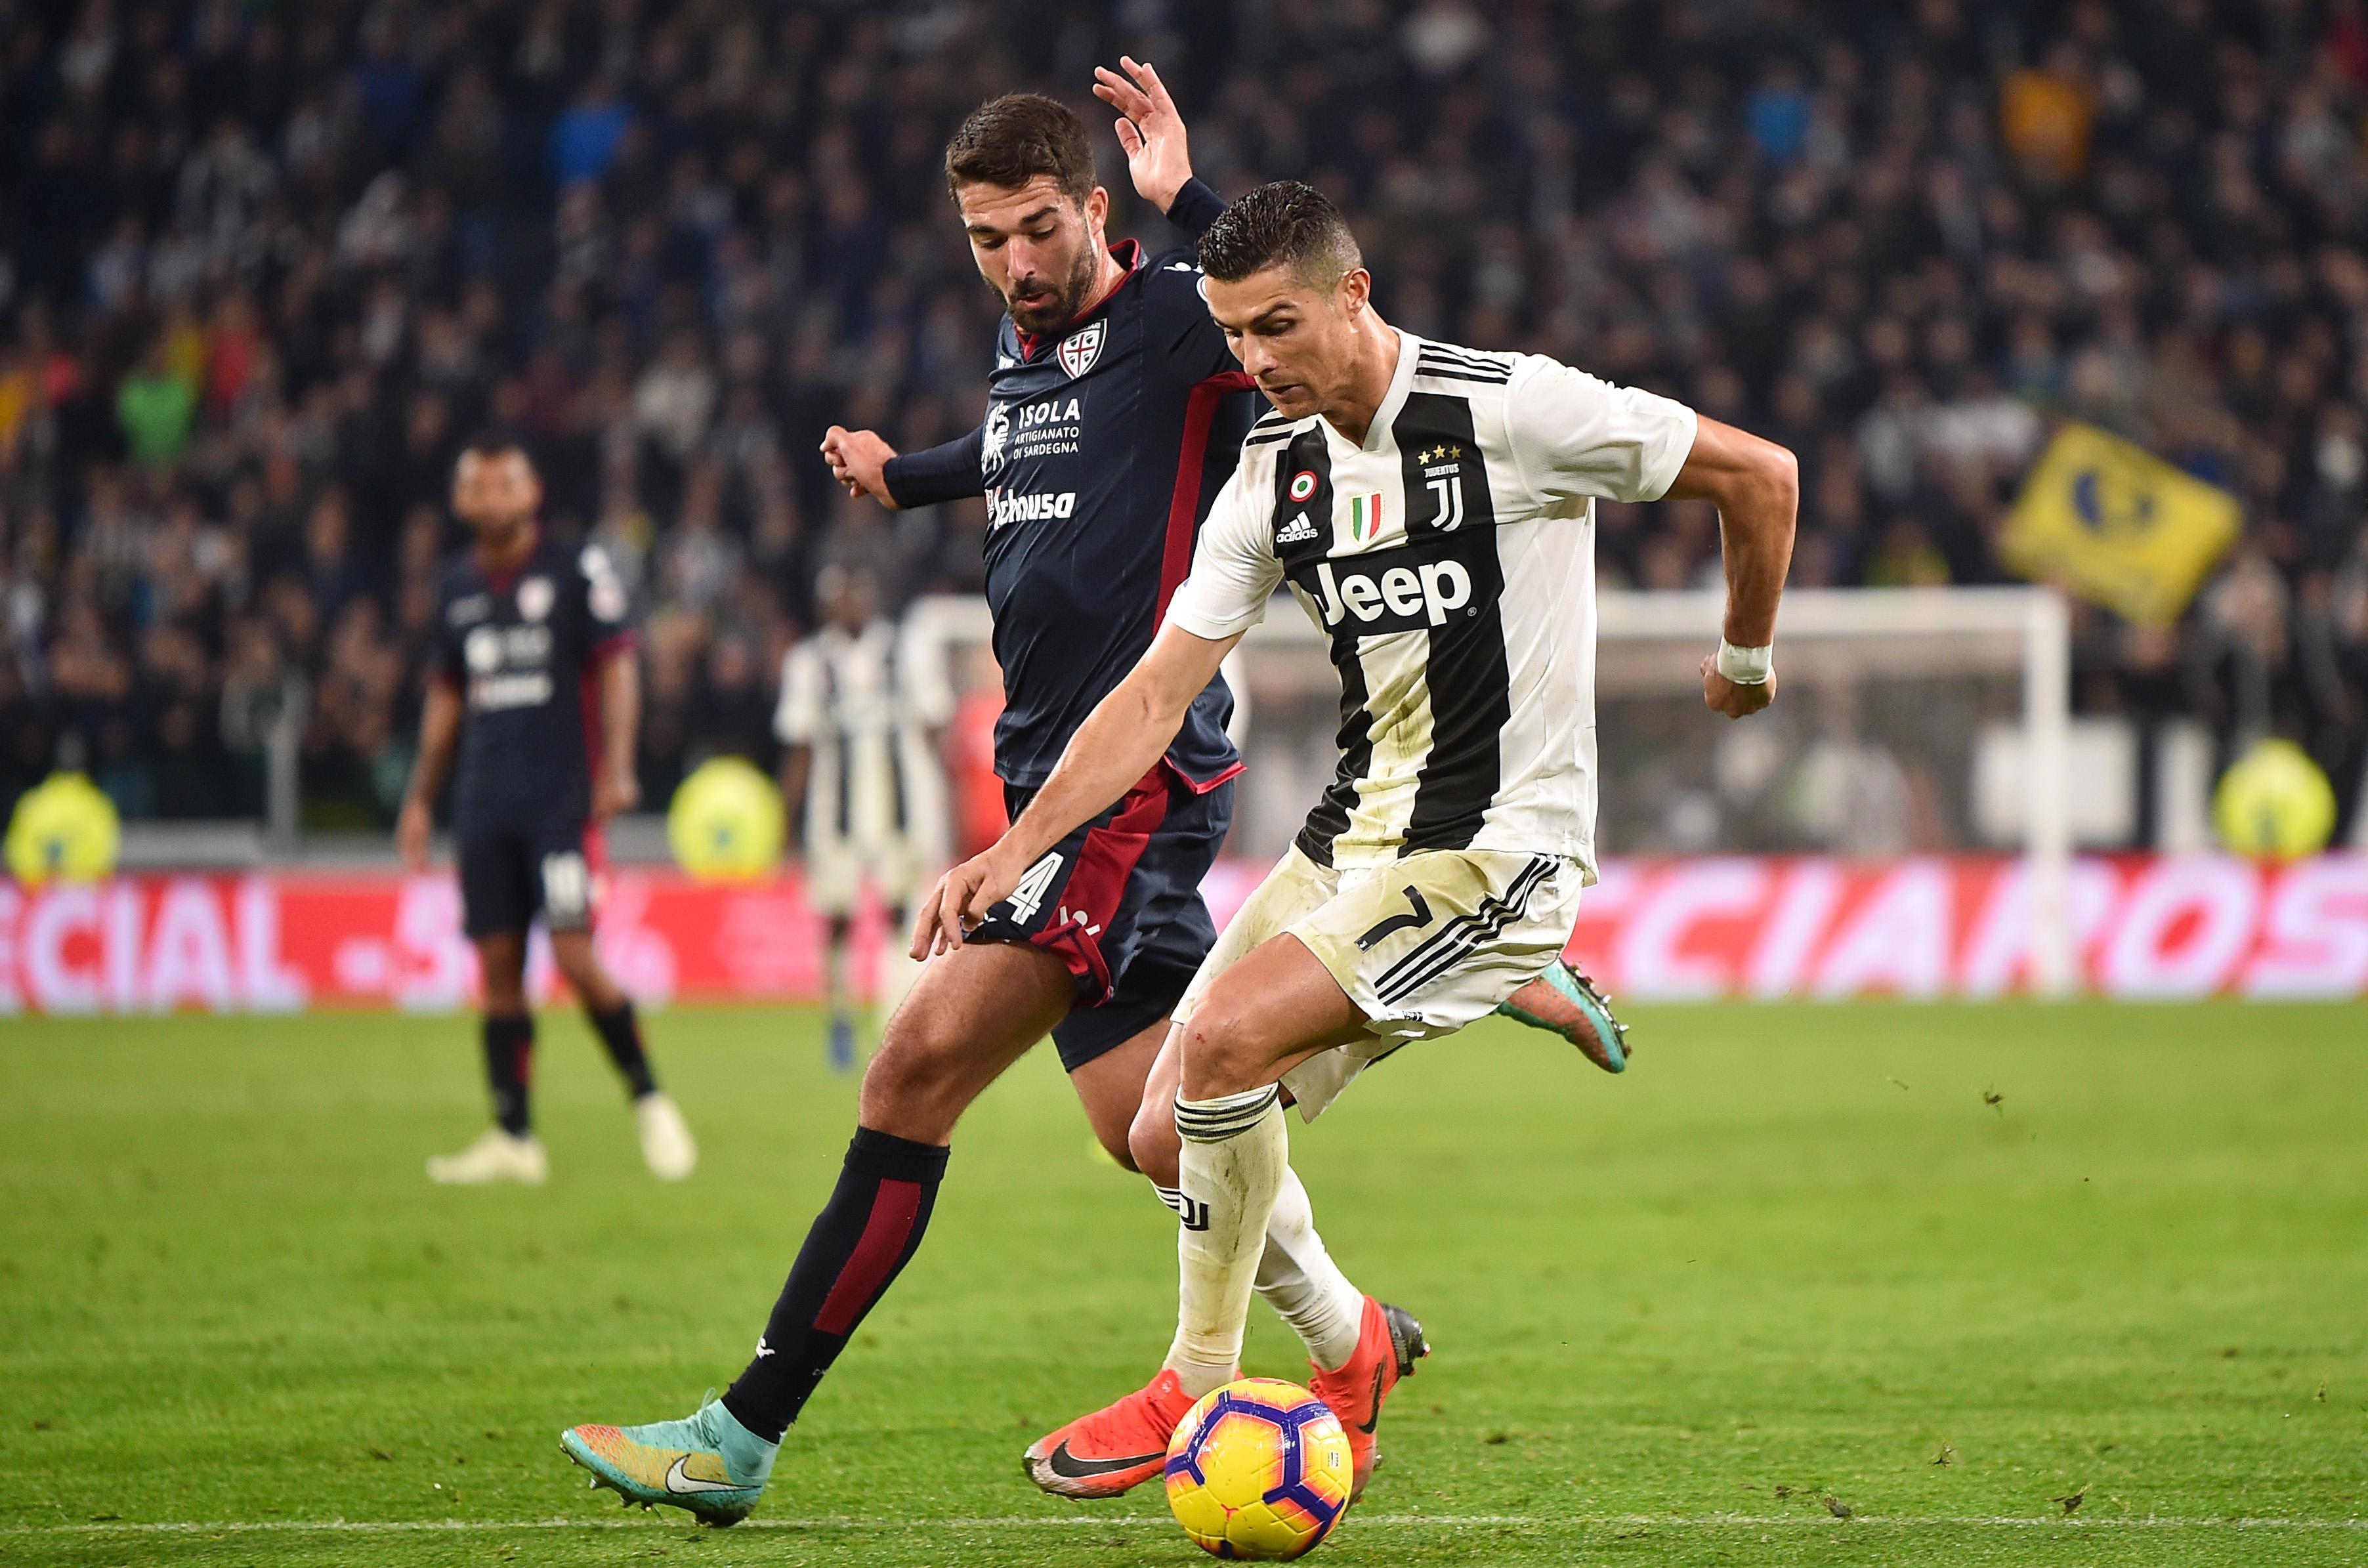 2018.11.03, Turyn, Seria A 2018/2019, Juventus Turyn - Cagliari Calcio N/z: Daniele Dessena, Cristiano Ronaldo, Foto Lukasz Laskowski / Press Focus